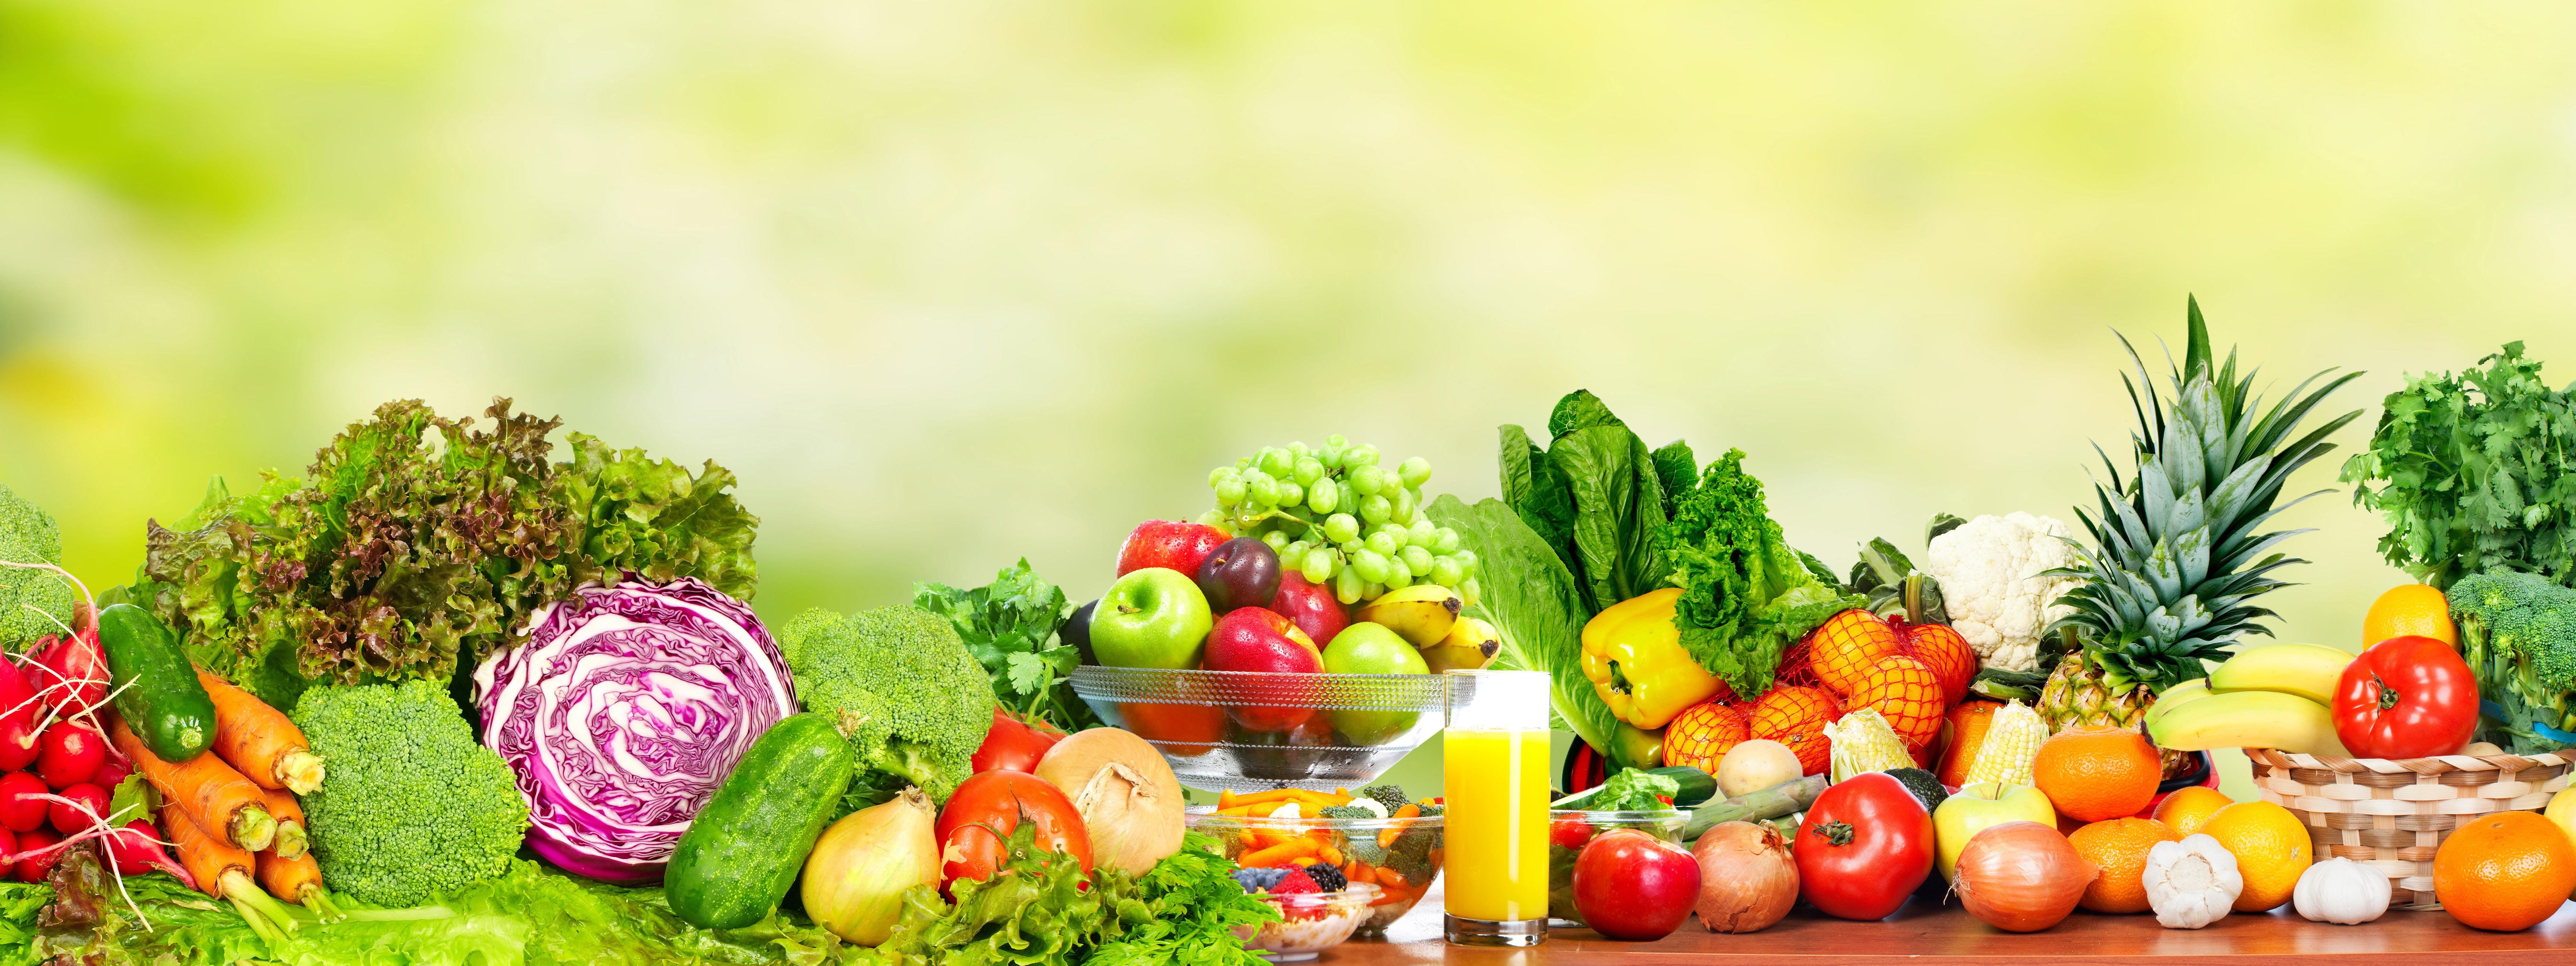 dieta acido urico alto pdf que medicina natural es buena para la gota tratar la gota de forma natural